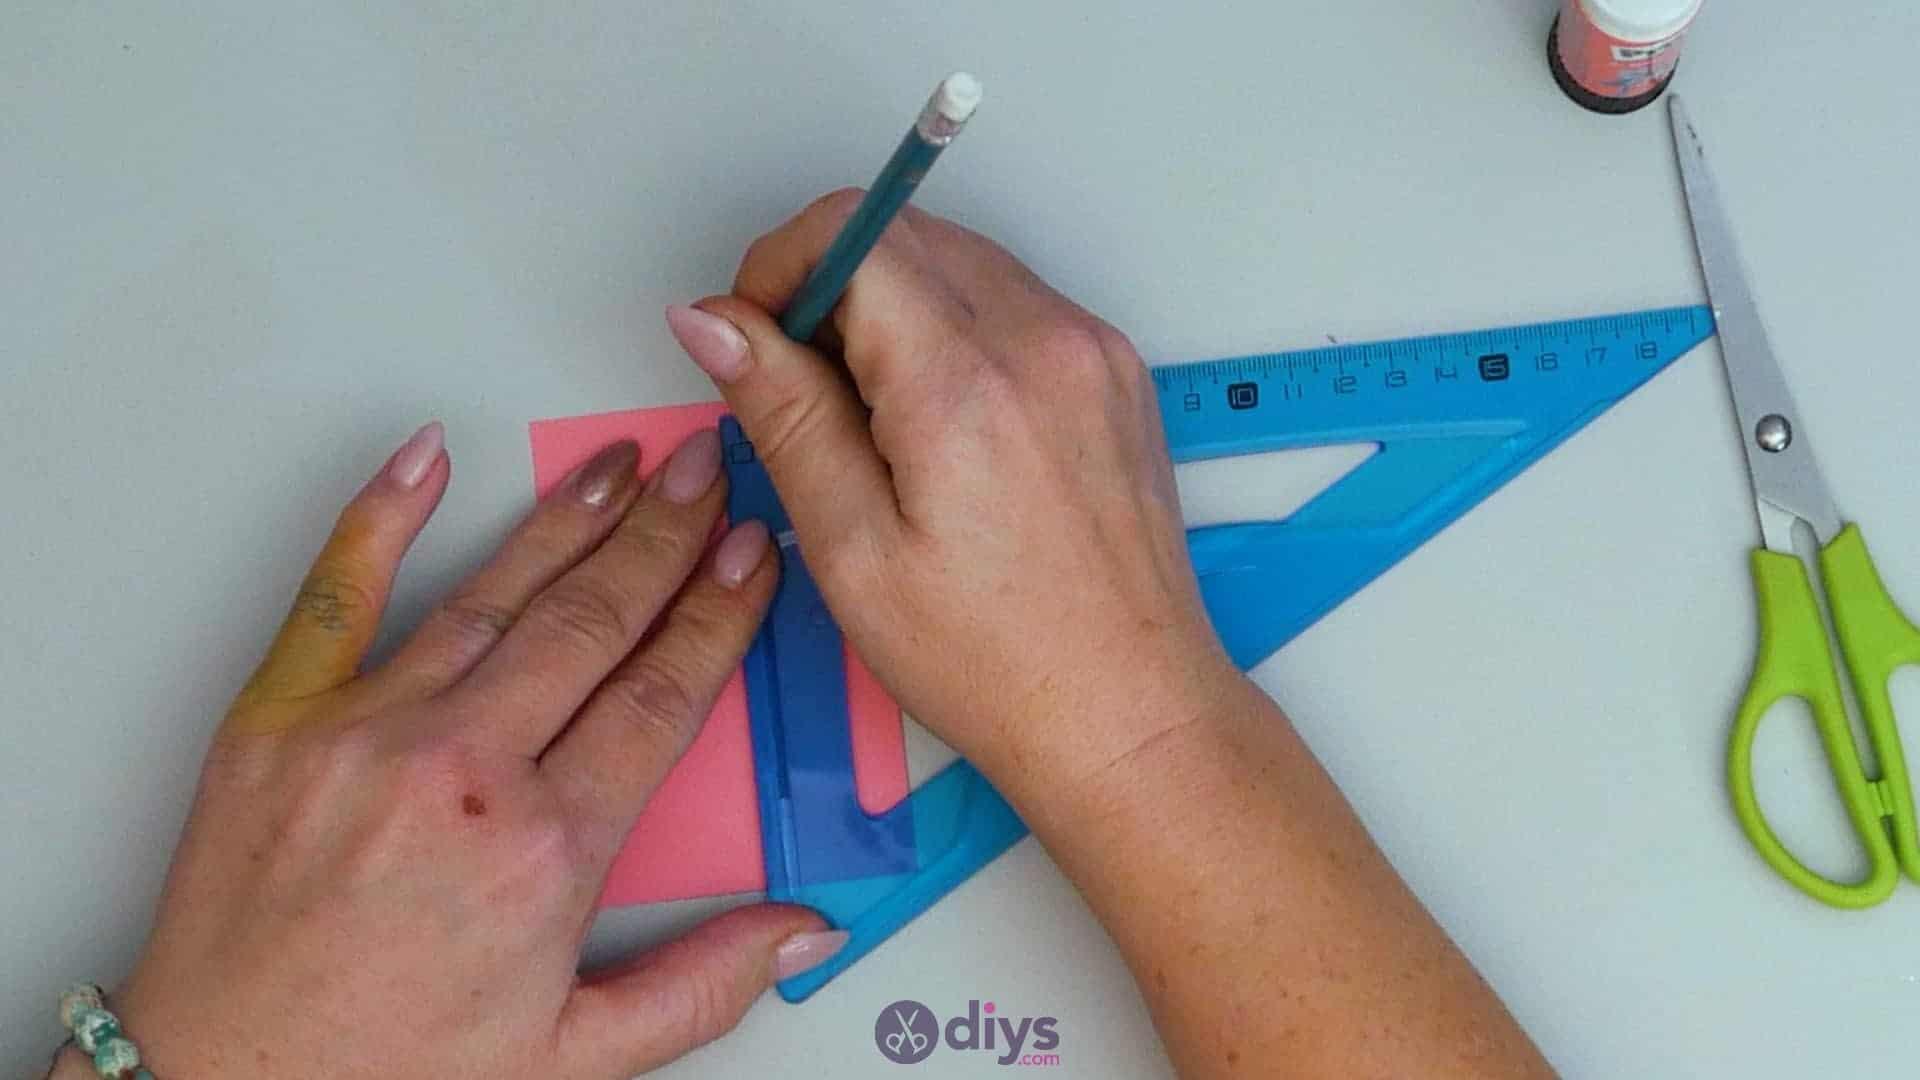 Diy lipstick gift card step 5b